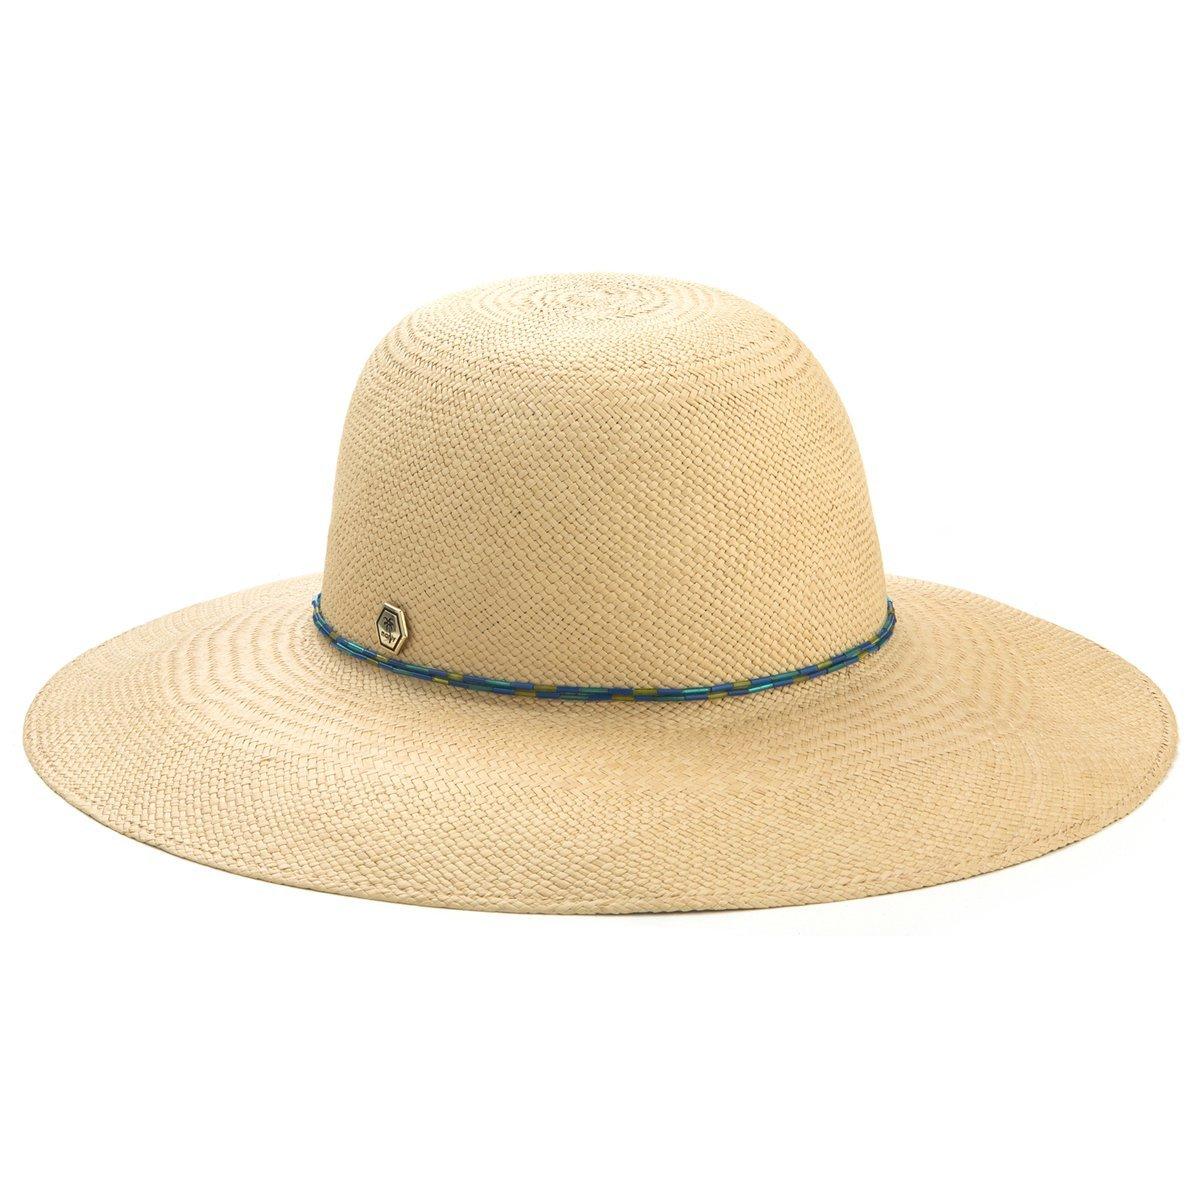 Chapéu Aba Longa Panamá Manly  3a56994183b